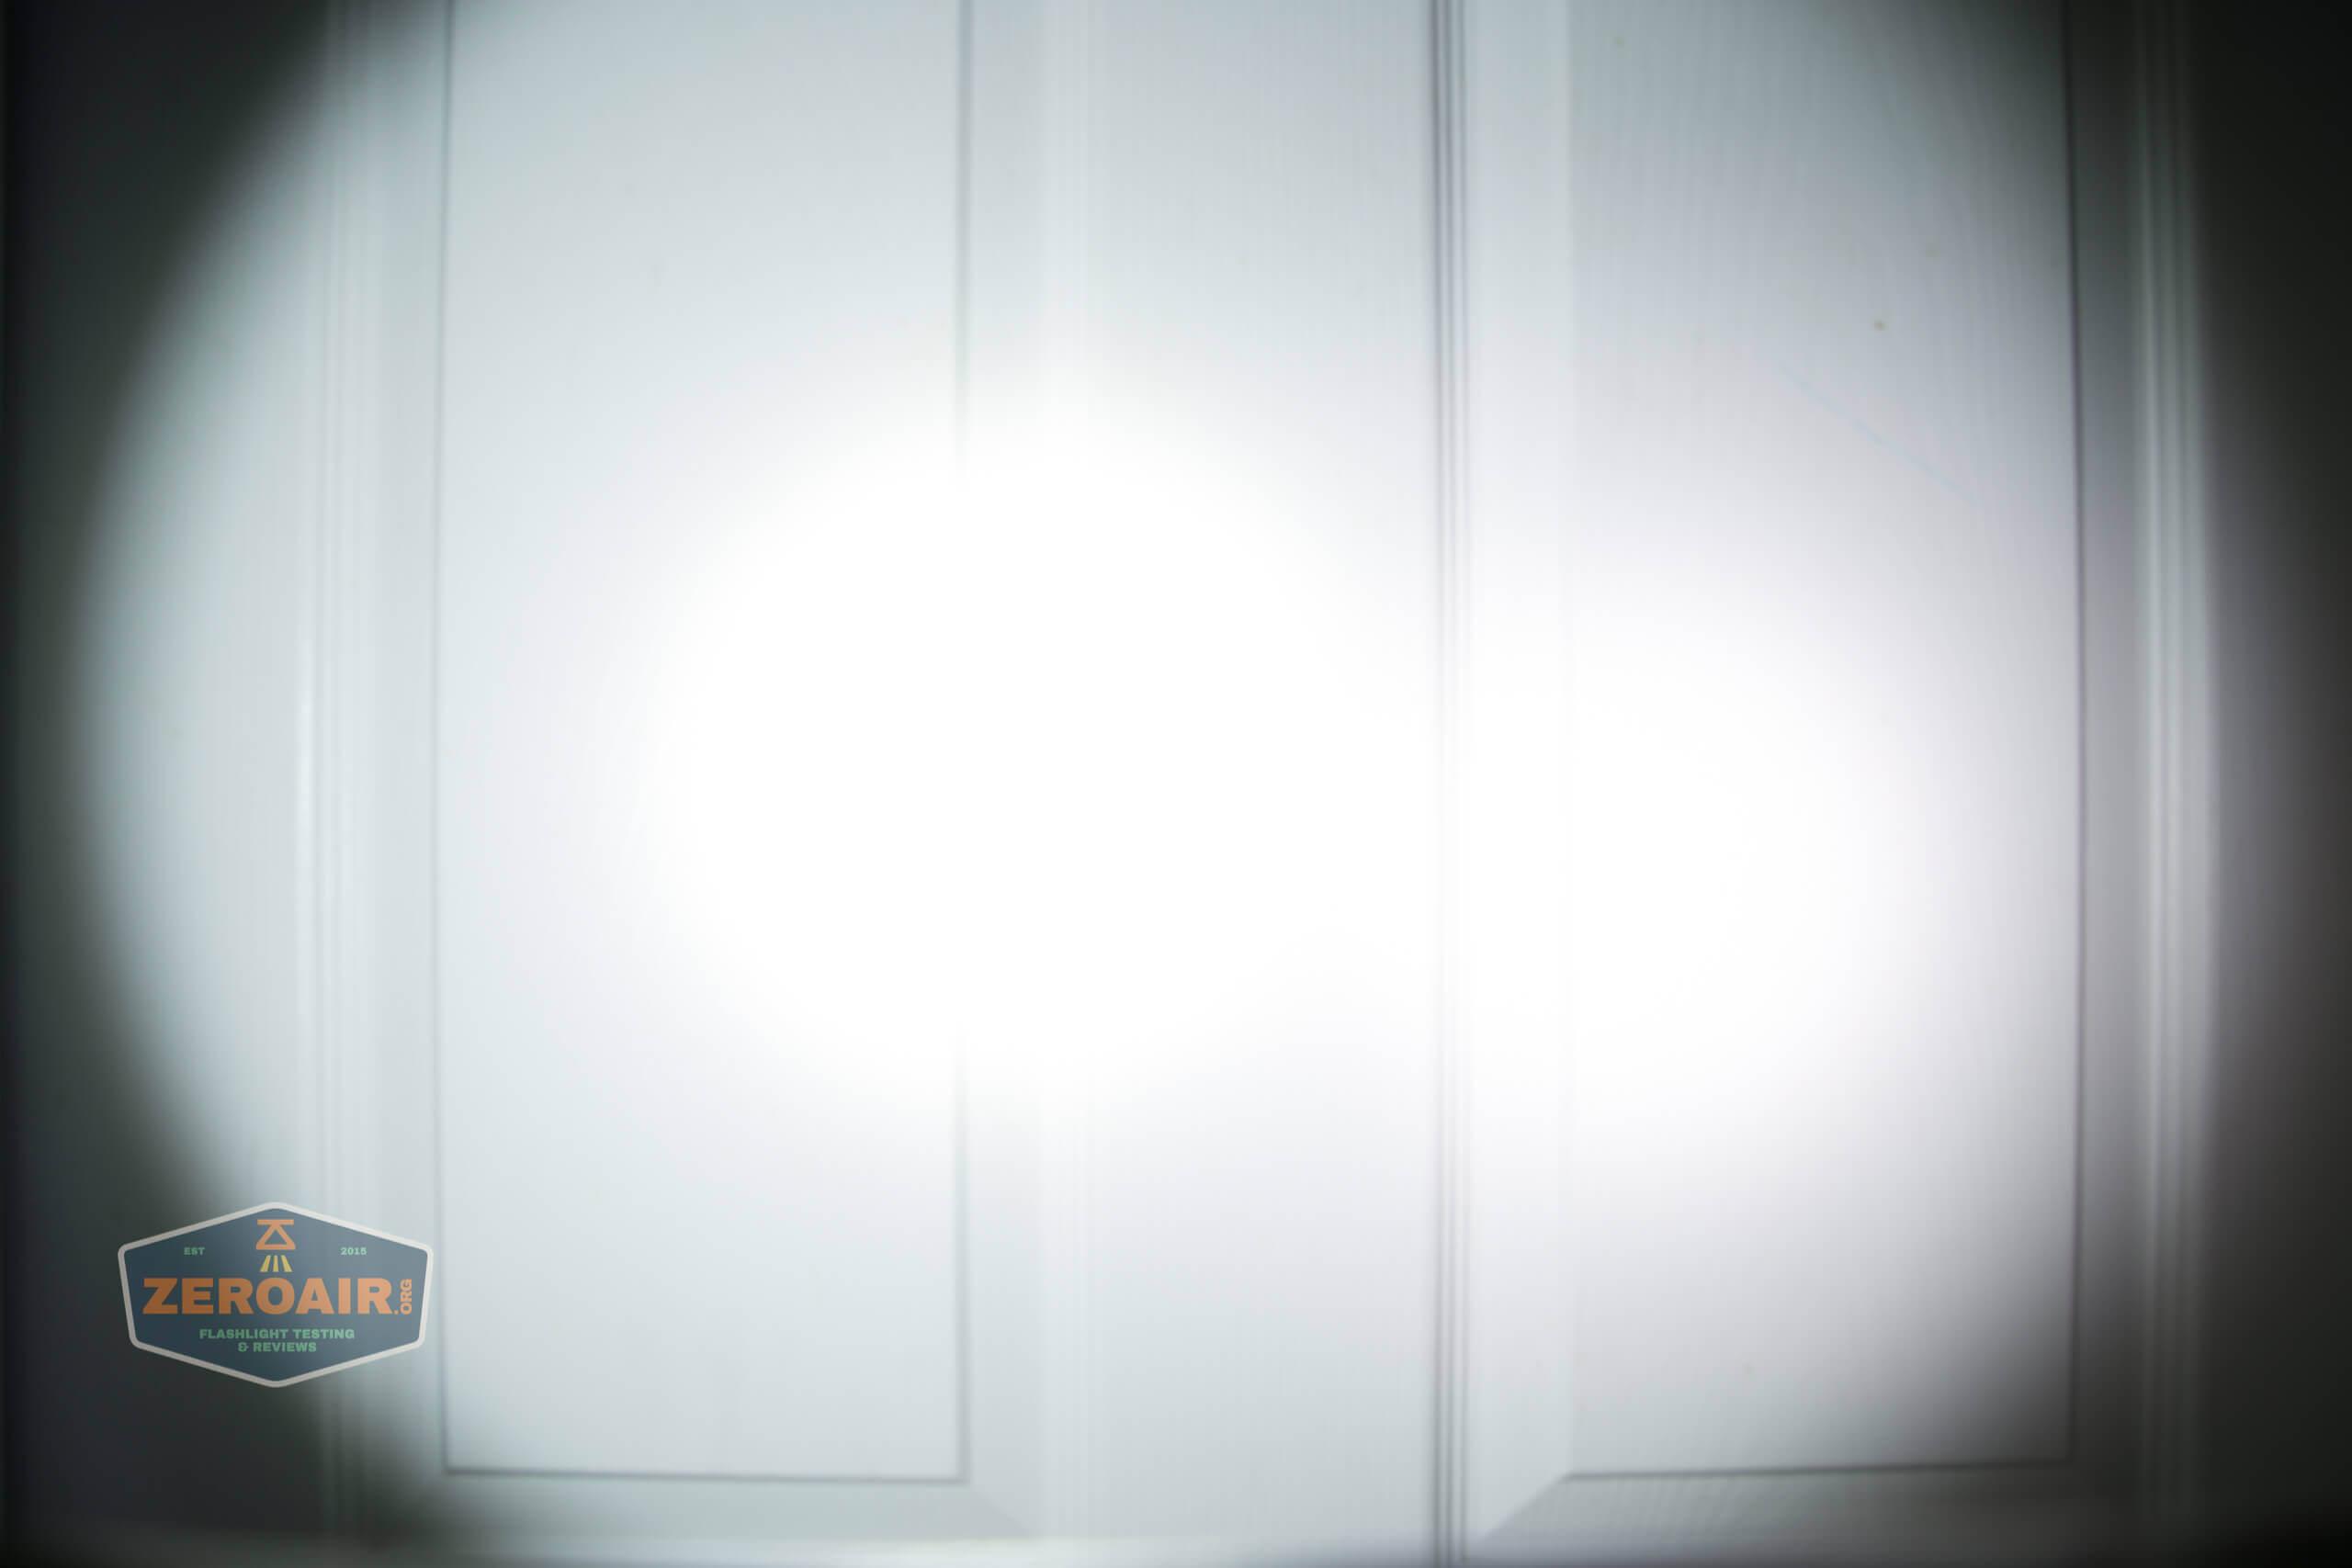 skilhunt m300 18650 flashlight beamshot door 5